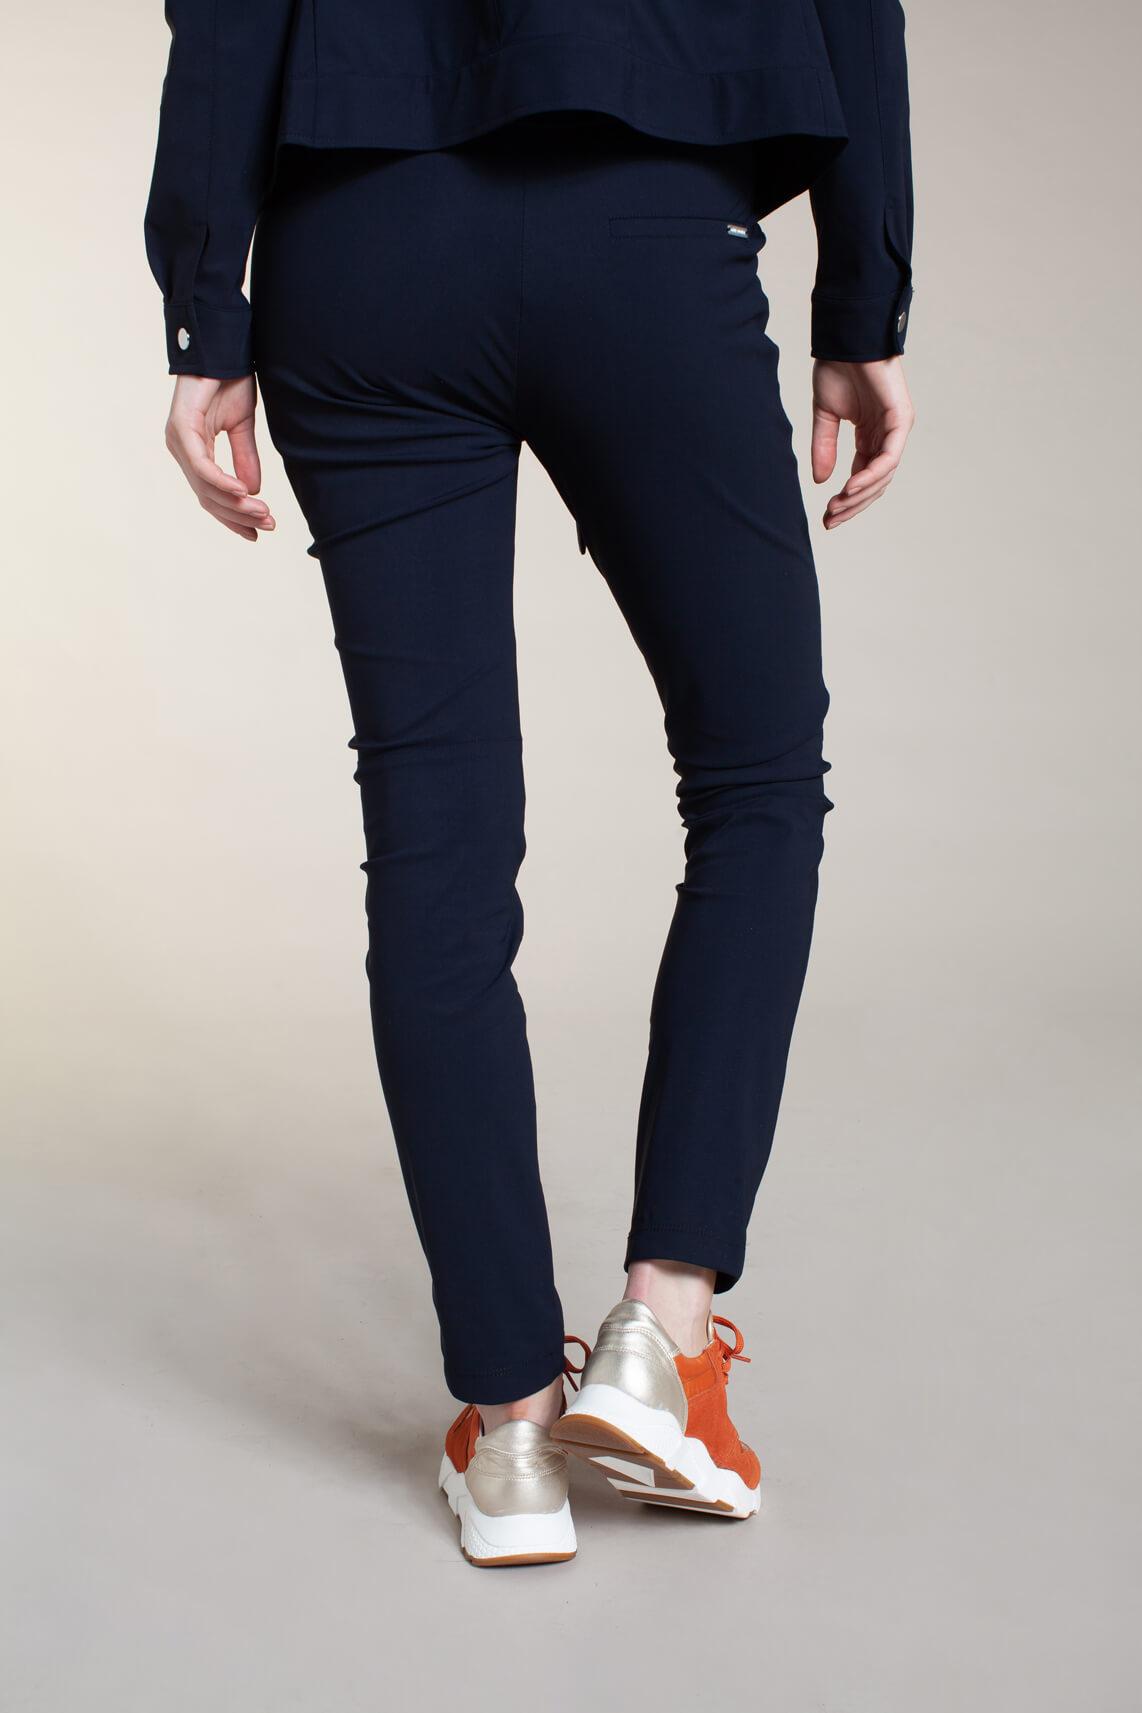 Jane Lushka Dames Vera broek met strik Blauw